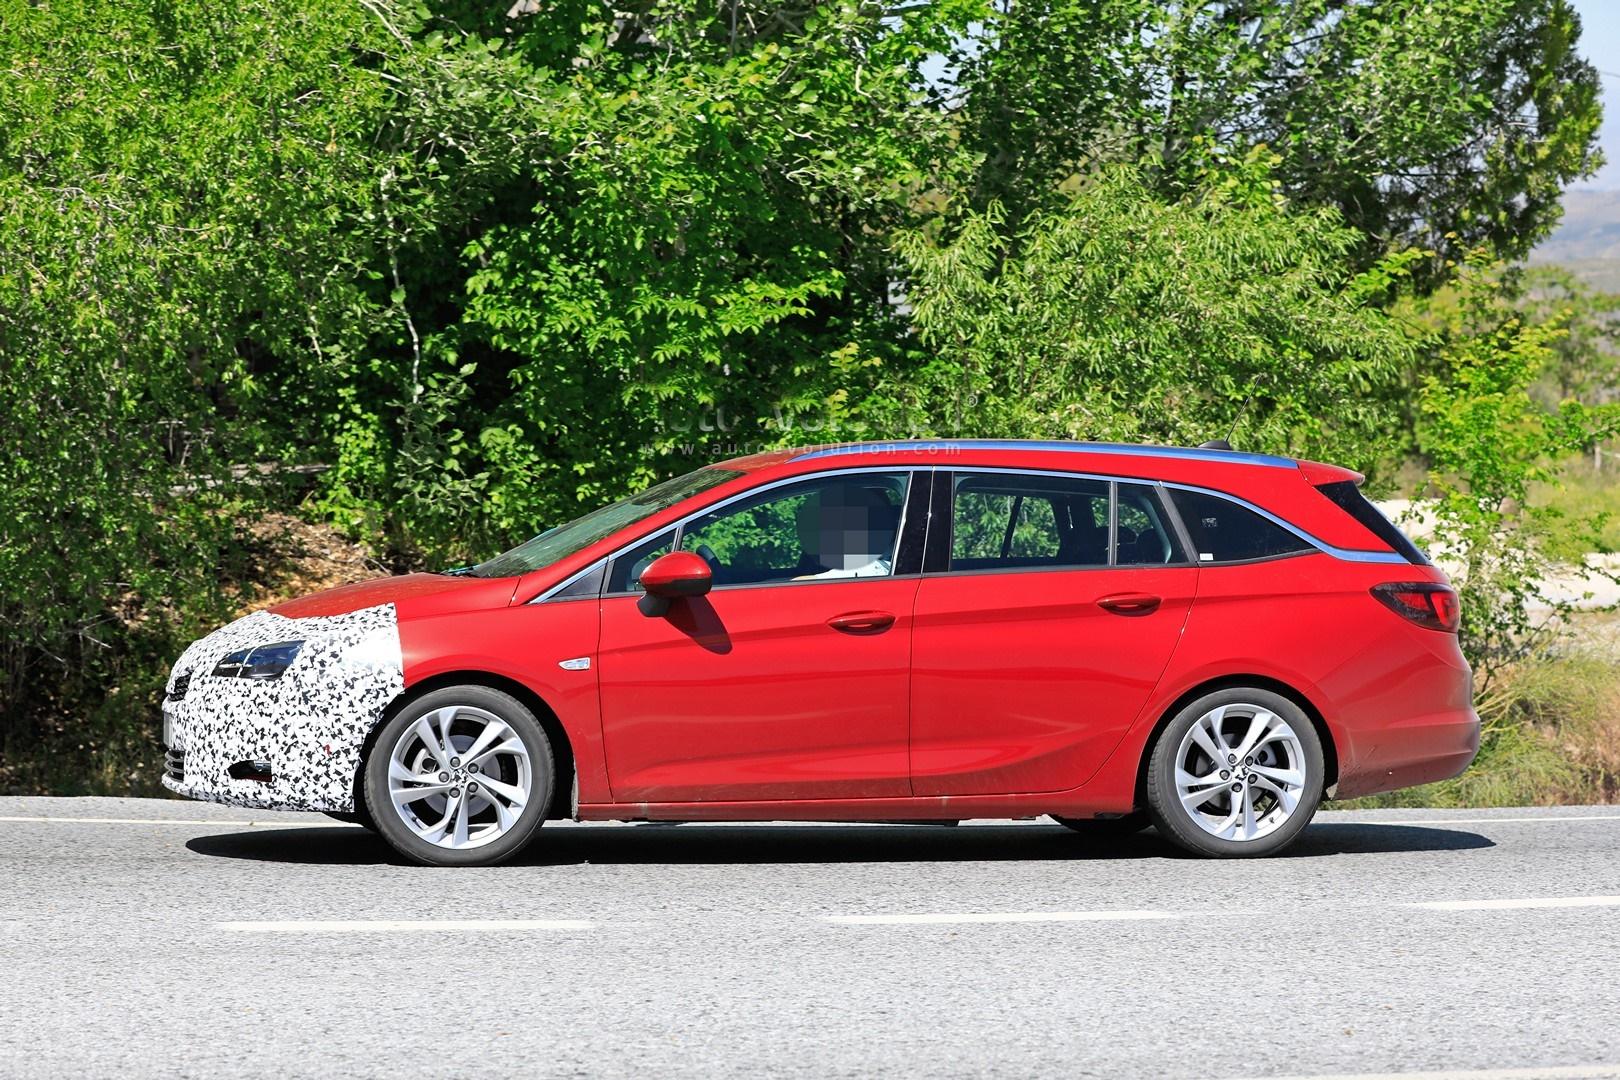 Restilizovana Opel Astra karavan dobija dva nova motora